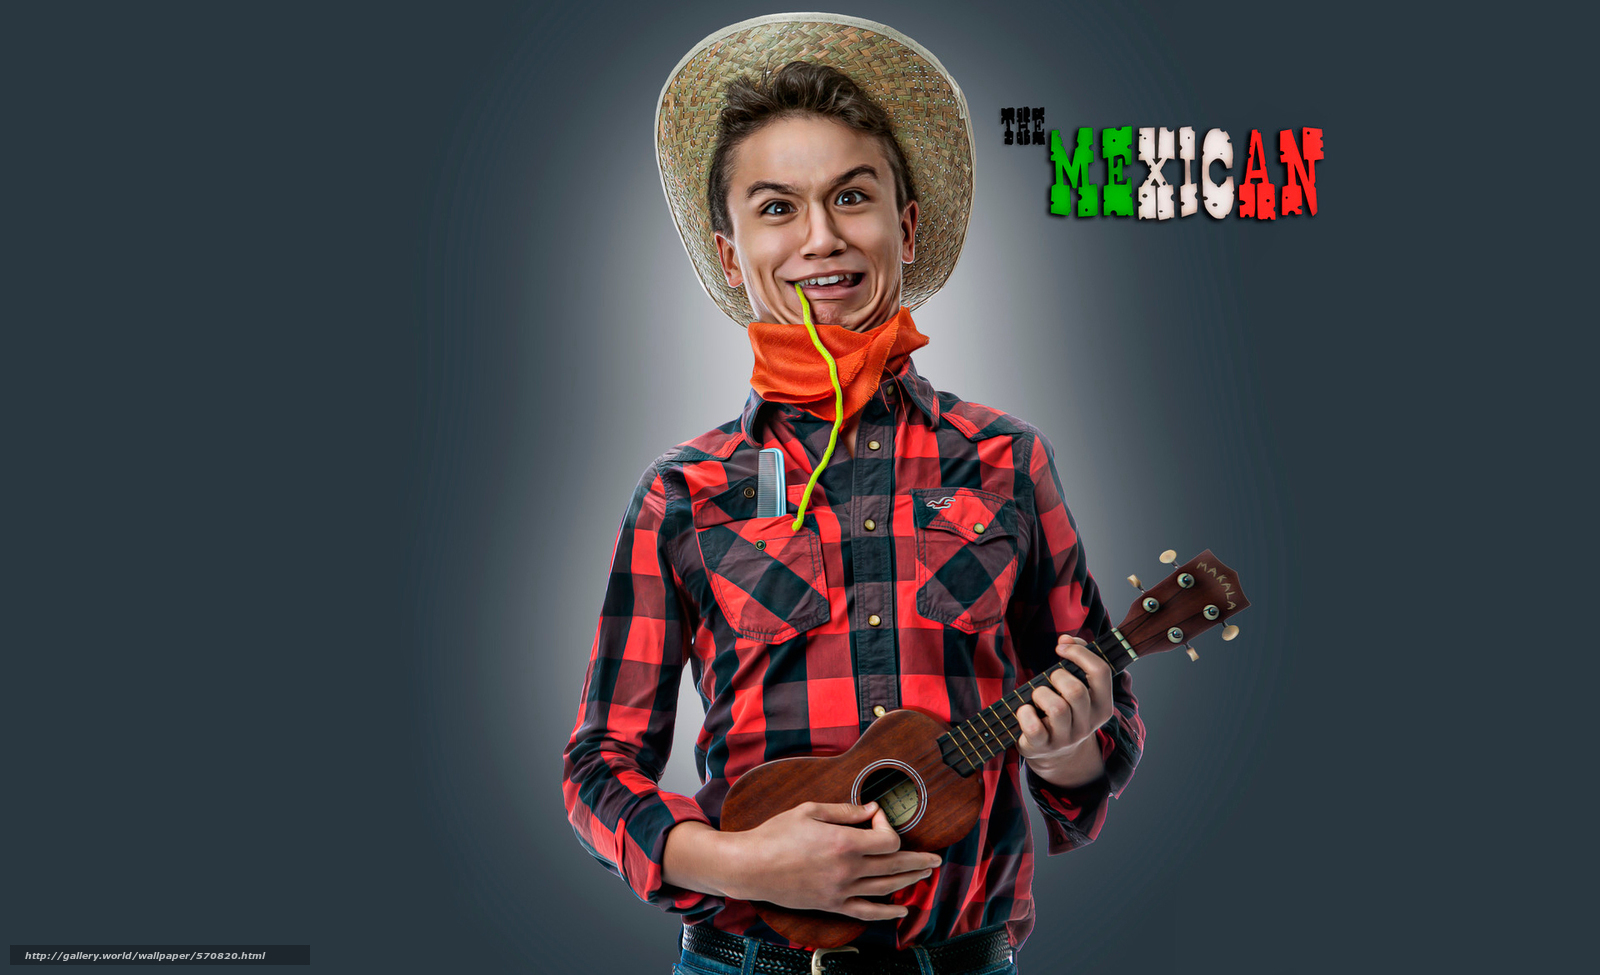 Tlcharger Fond D'ecran Mexicain, Humour, Musicien Fonds D avec Musicien Mexicain